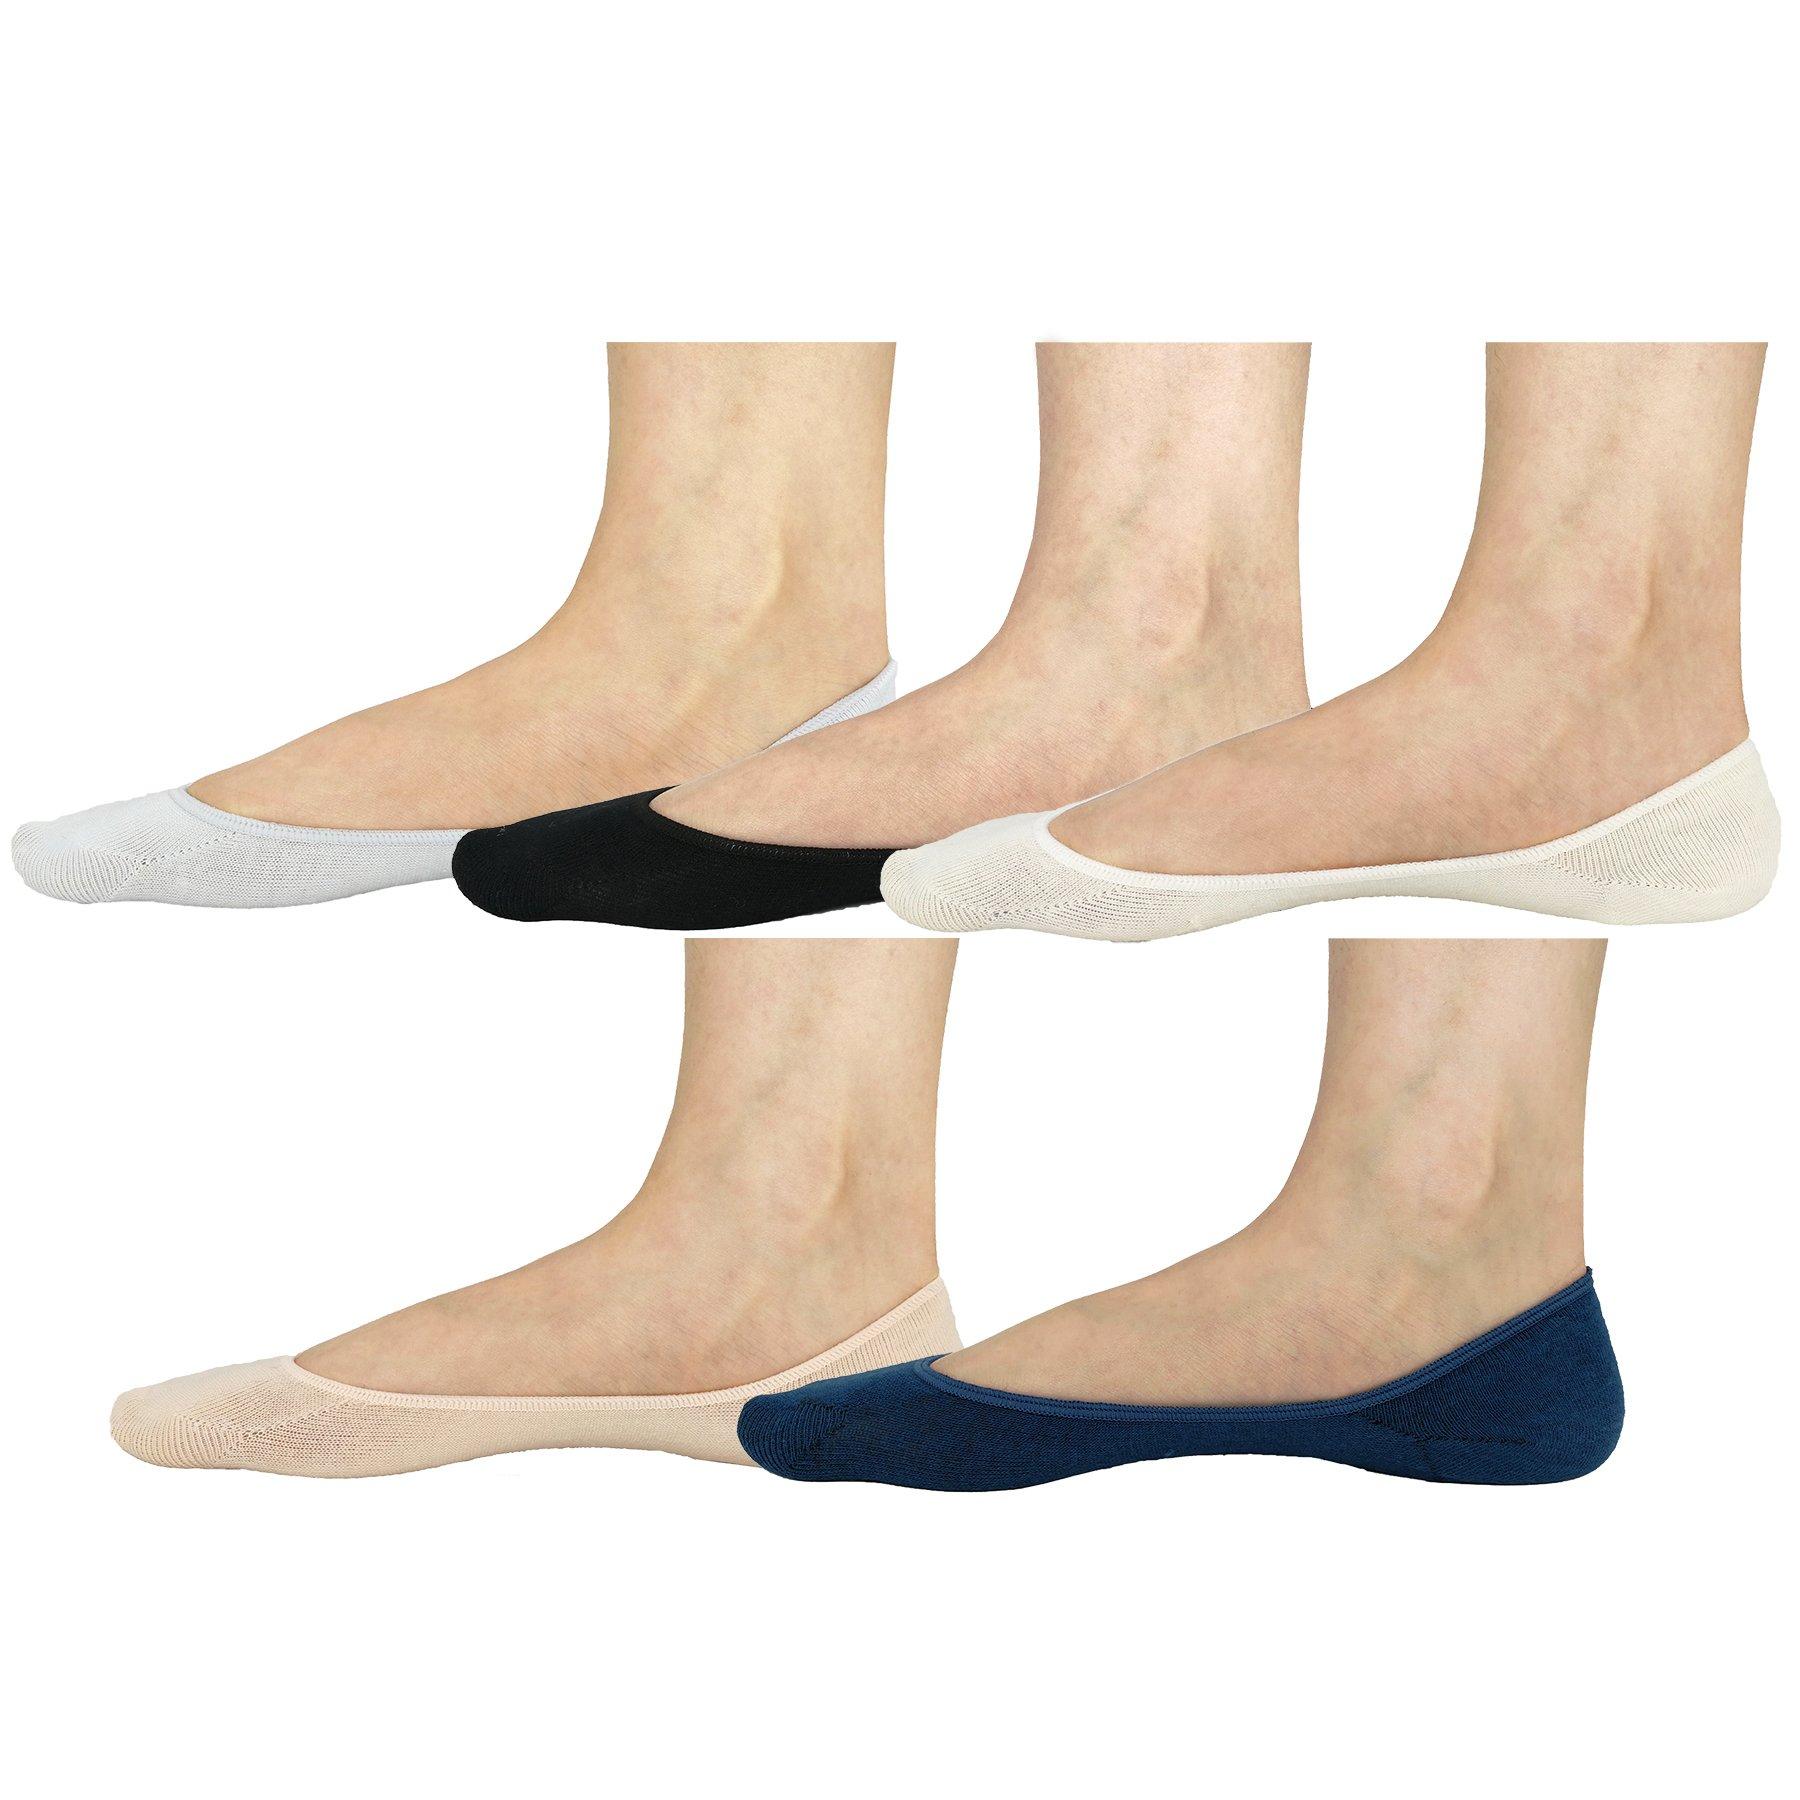 Women No Show Socks Cotton Liner Socks Non-Slip No Show Socks Low Cut Boat Socks 5-Pairs